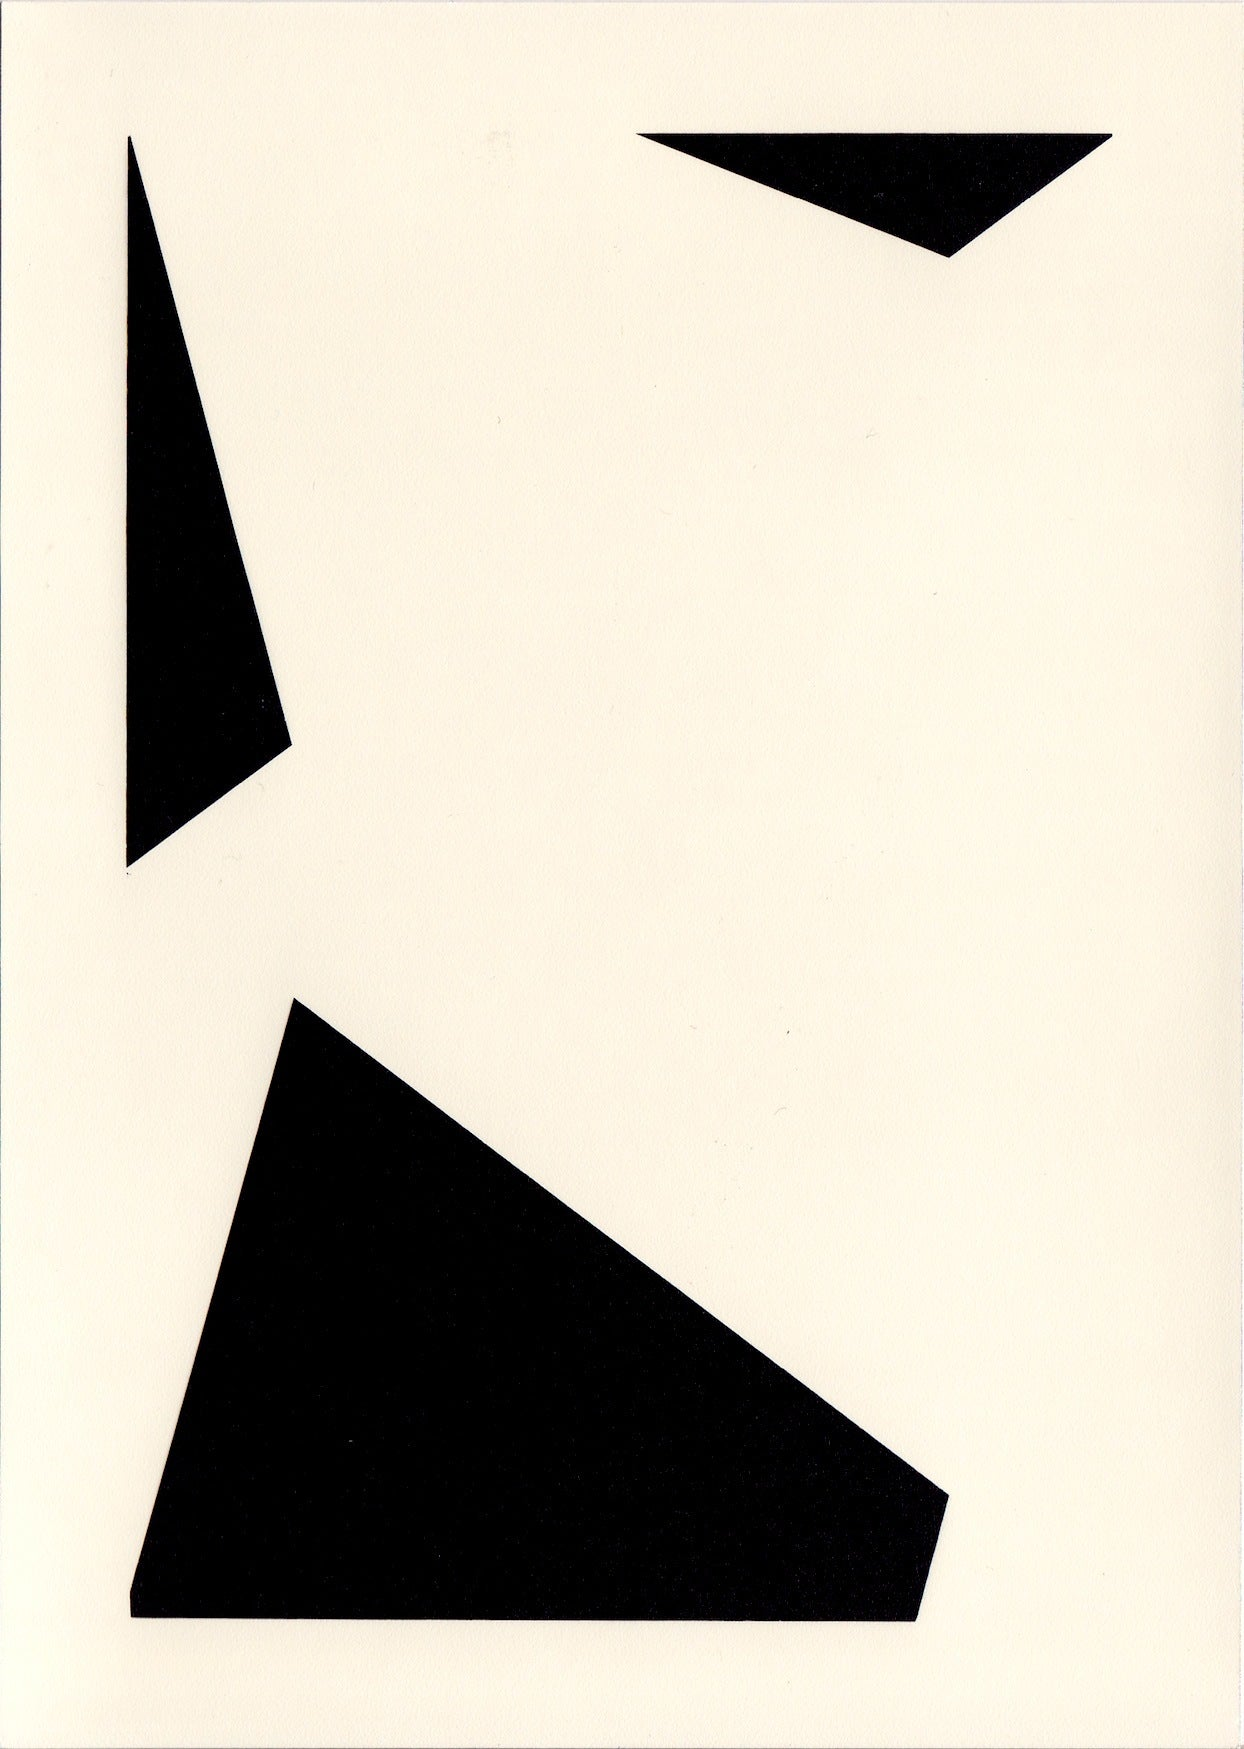 Richard Caldicott Black and White Photograph - Unique Photogram (14)